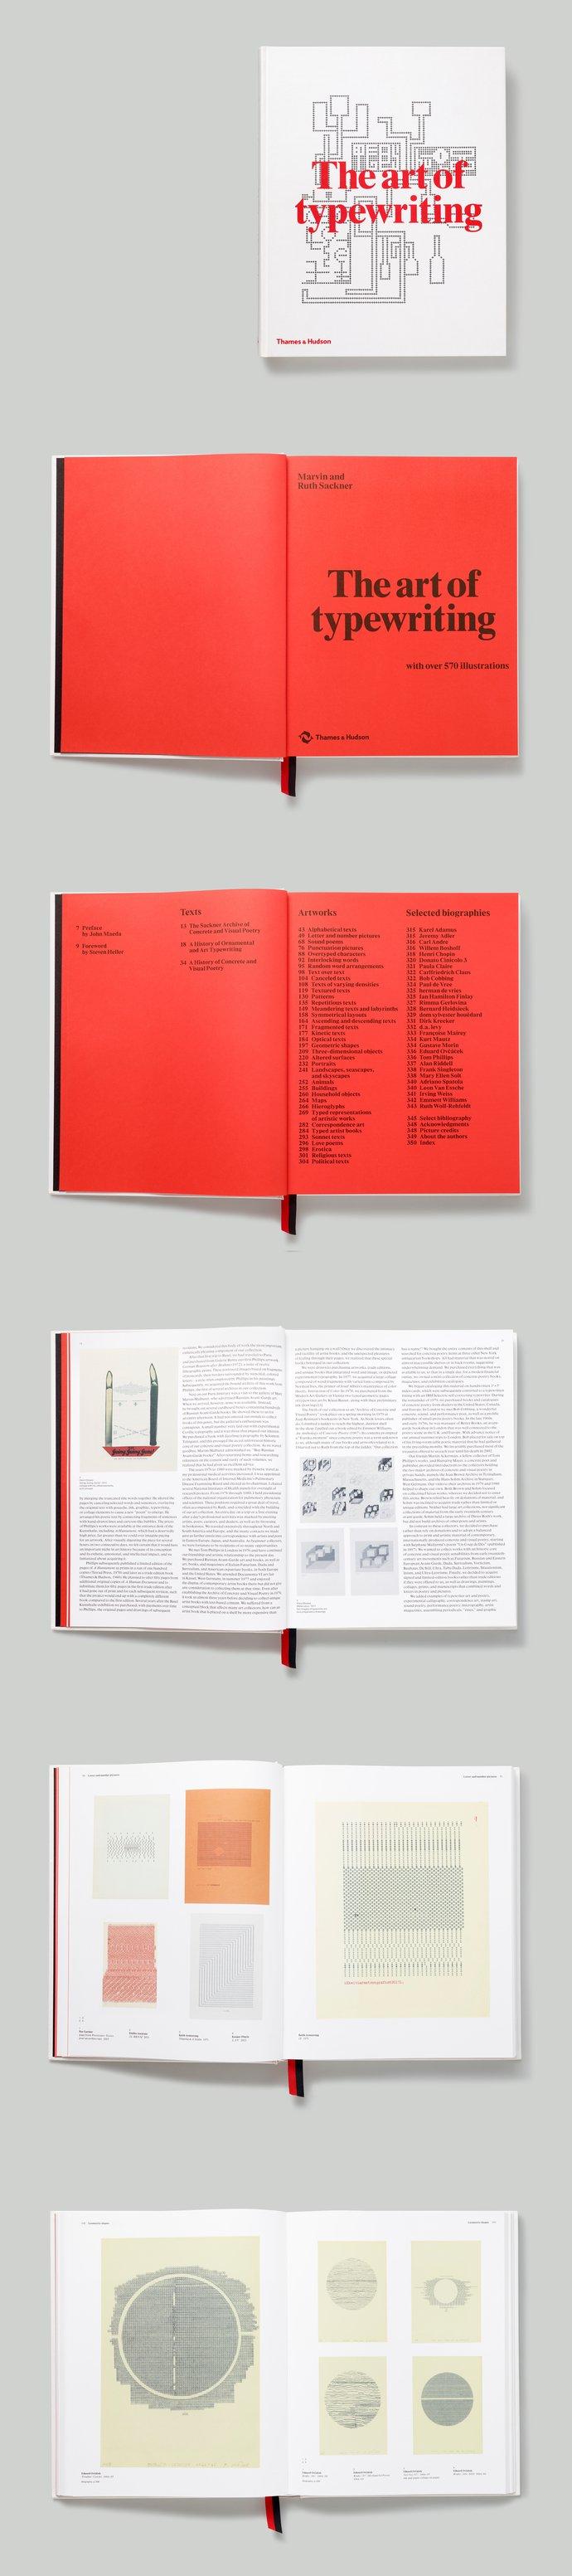 Thames & Hudson – The art of typewriting, 2015 (Publication), image 2